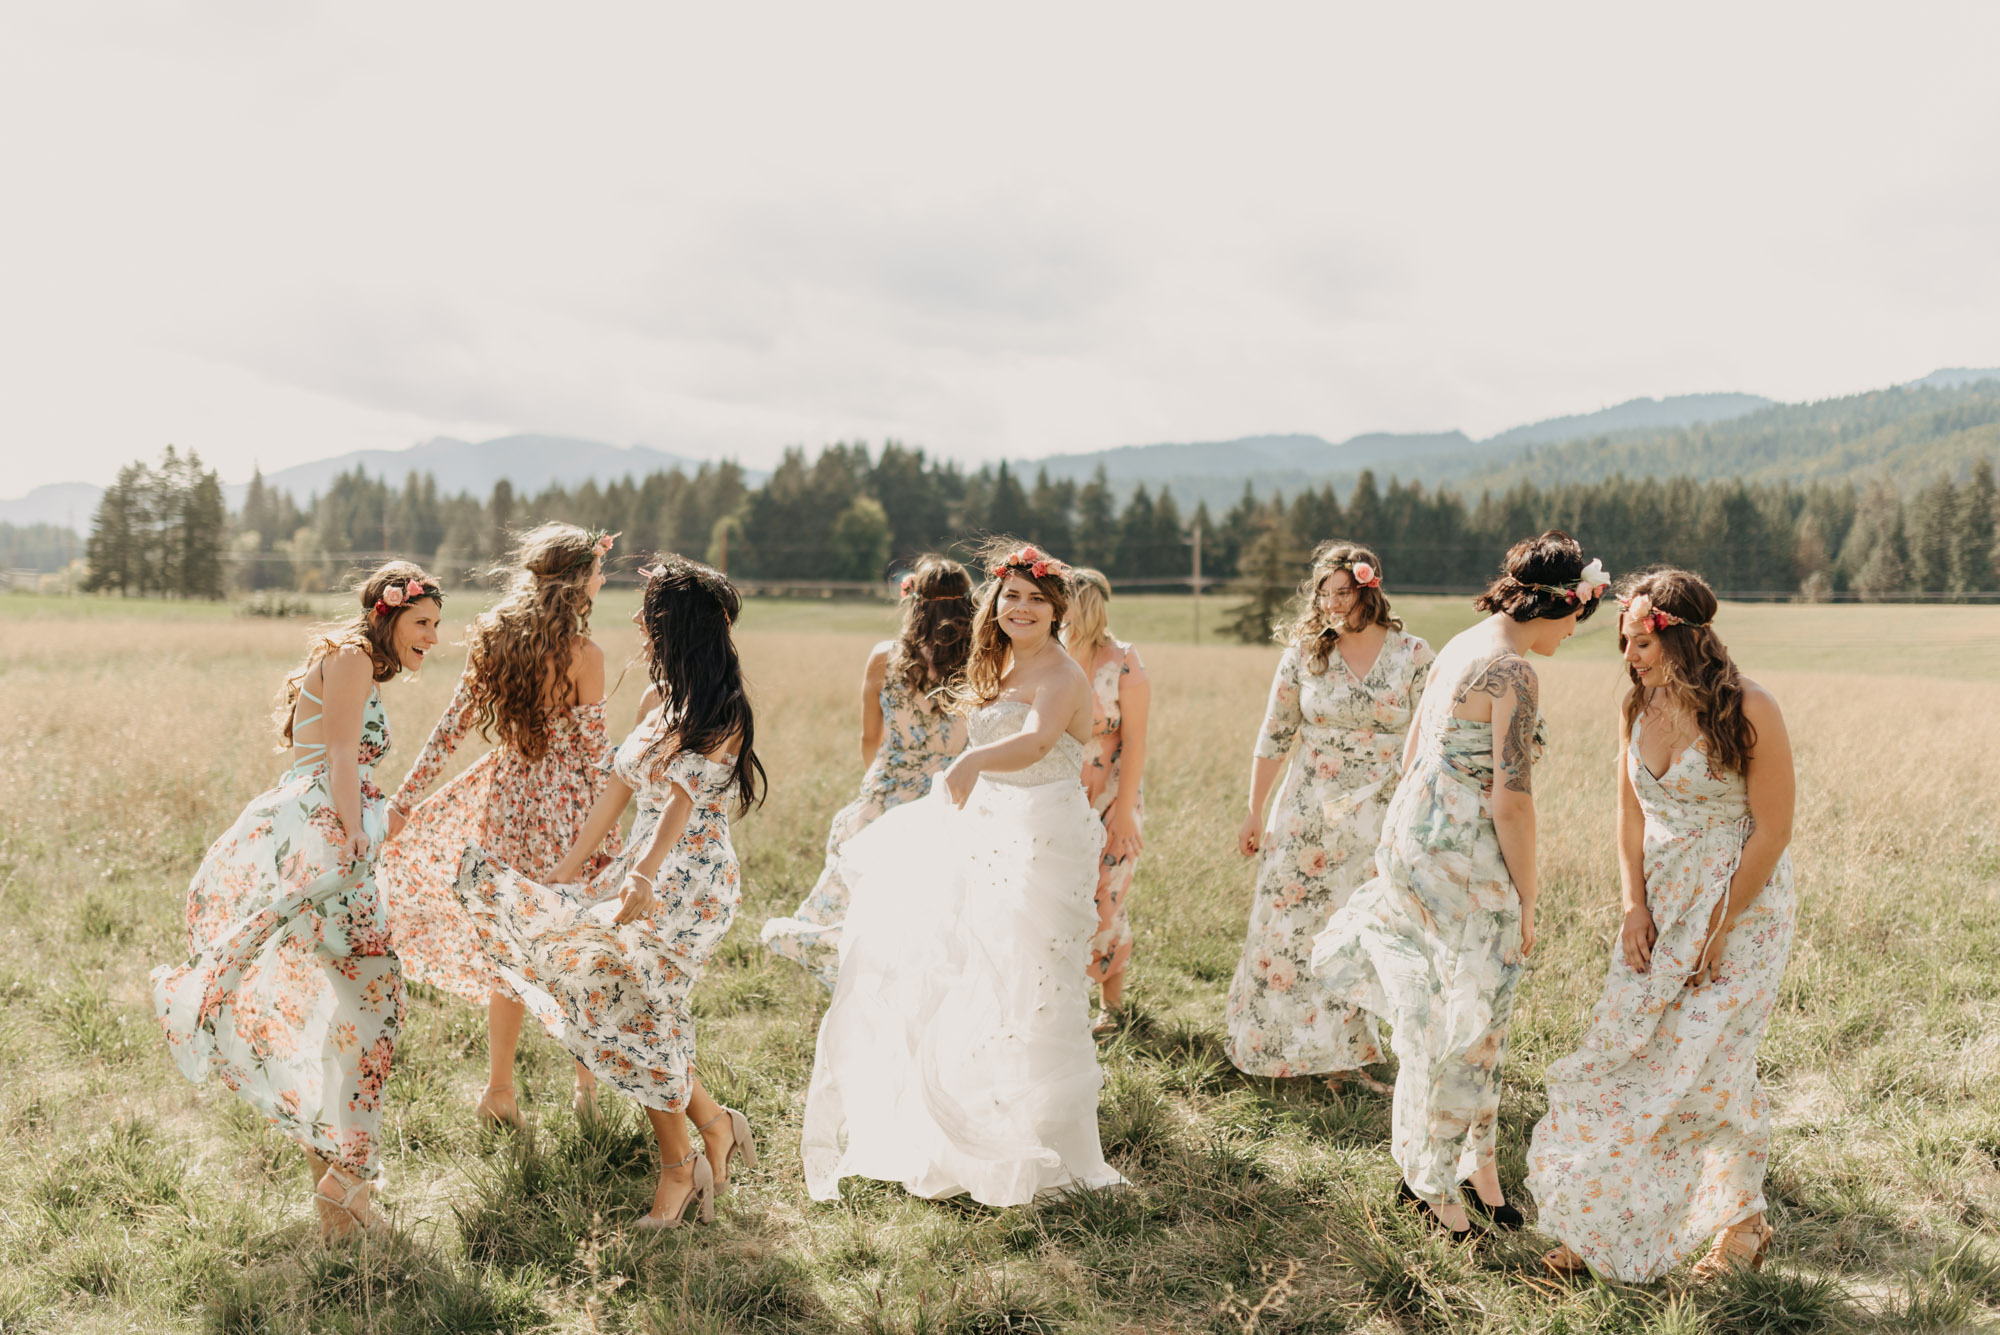 Bridal-Party-Free-People-Flower-Dresses-Washington-Wedding-8577.jpg